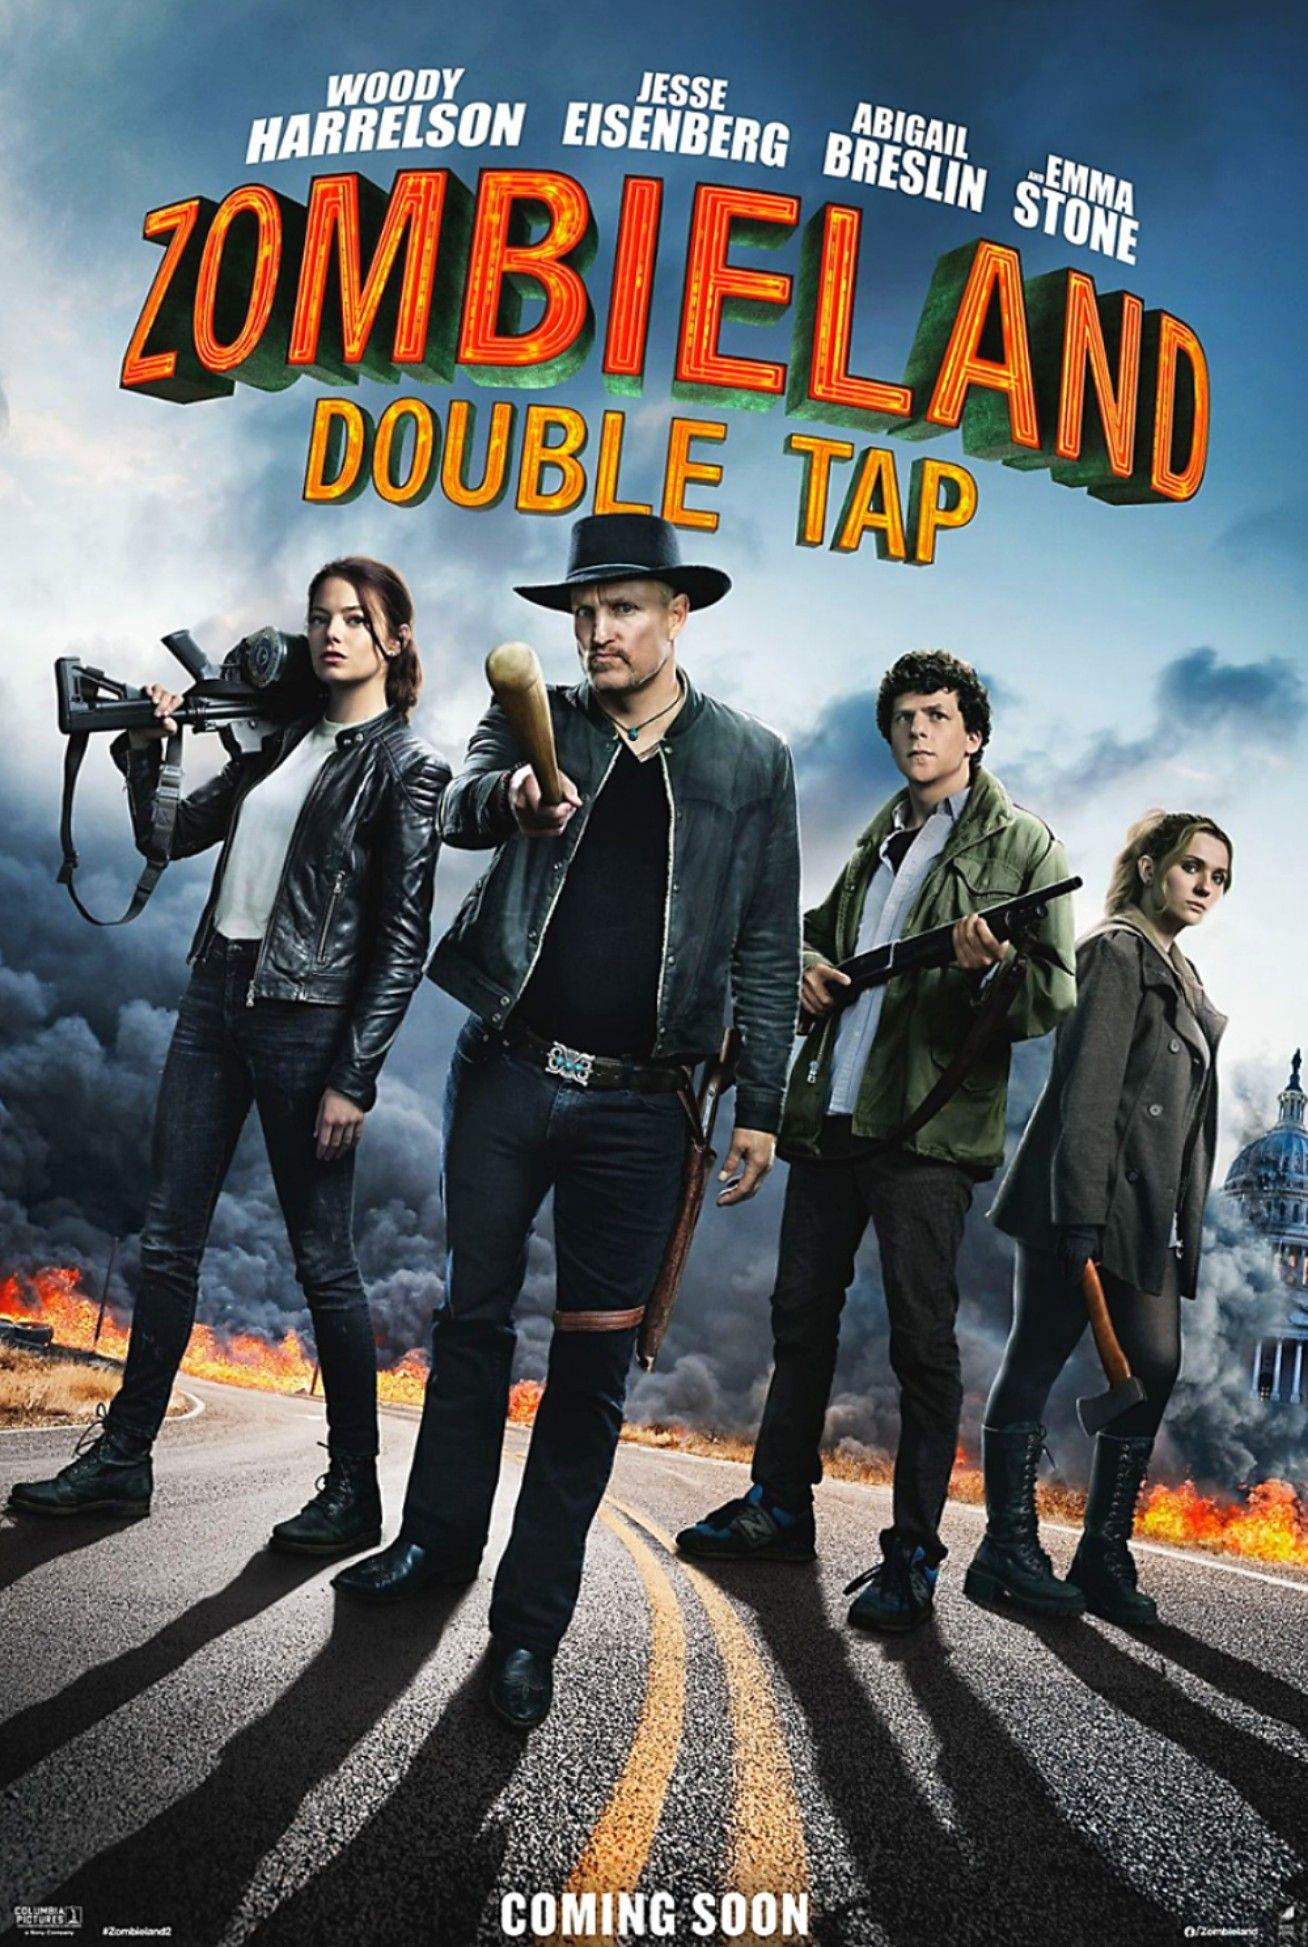 50 Sombras De Grey 2 Torrent zombieland double tap (2019) jesse eisenberg, woody